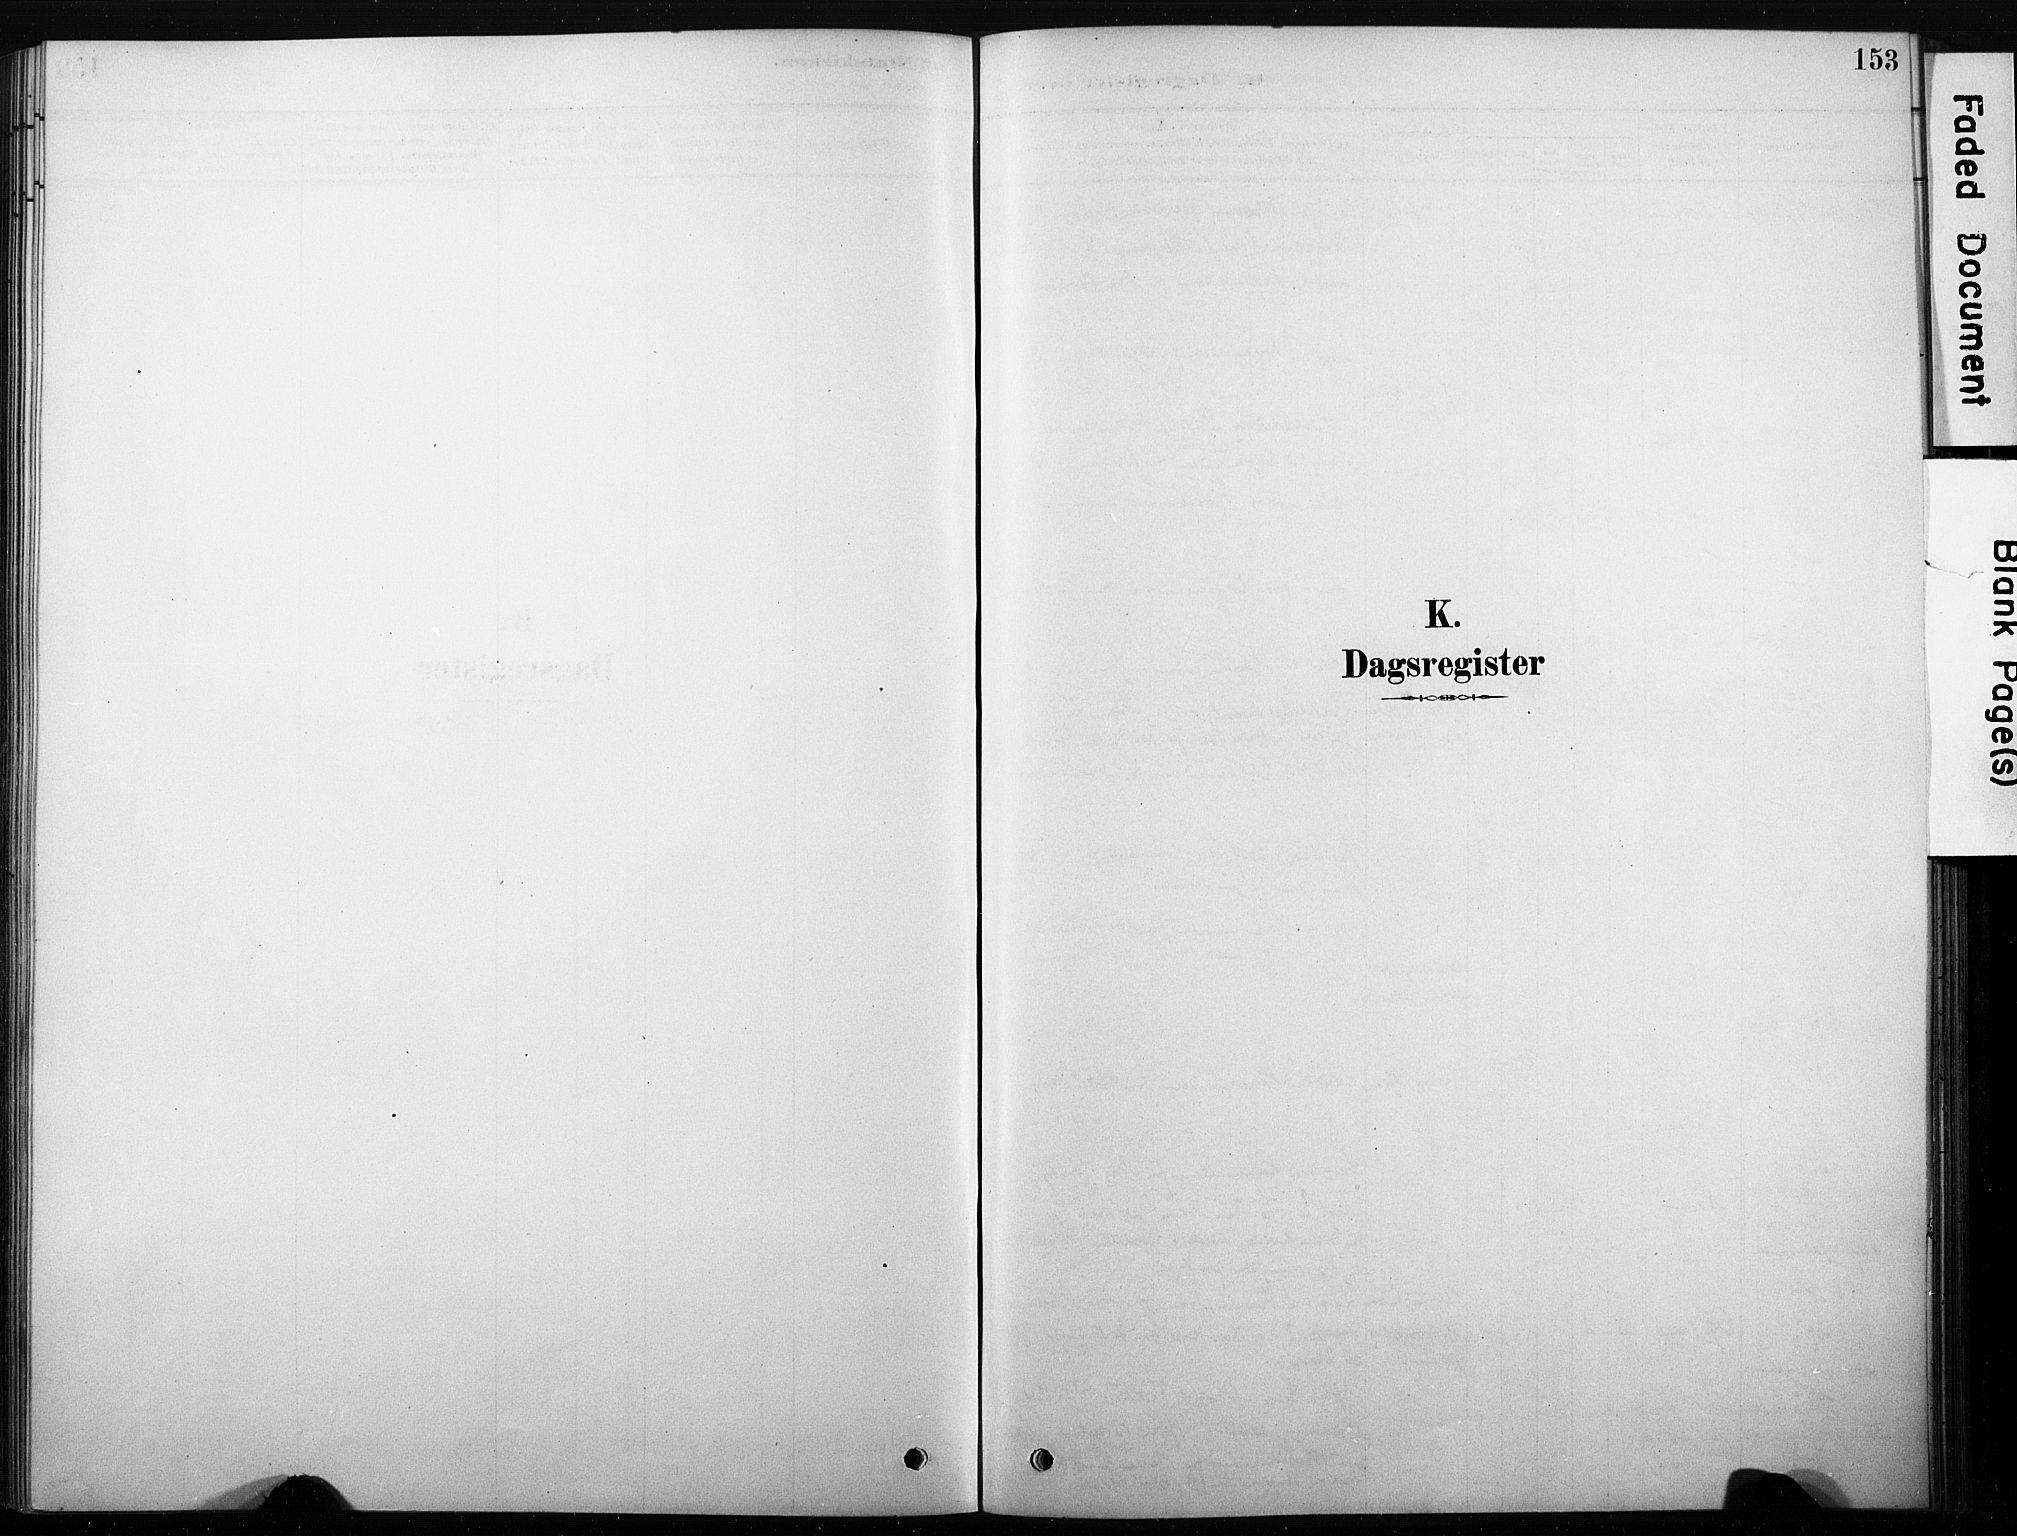 SAKO, Nore kirkebøker, F/Fb/L0001: Ministerialbok nr. II 1, 1878-1886, s. 153